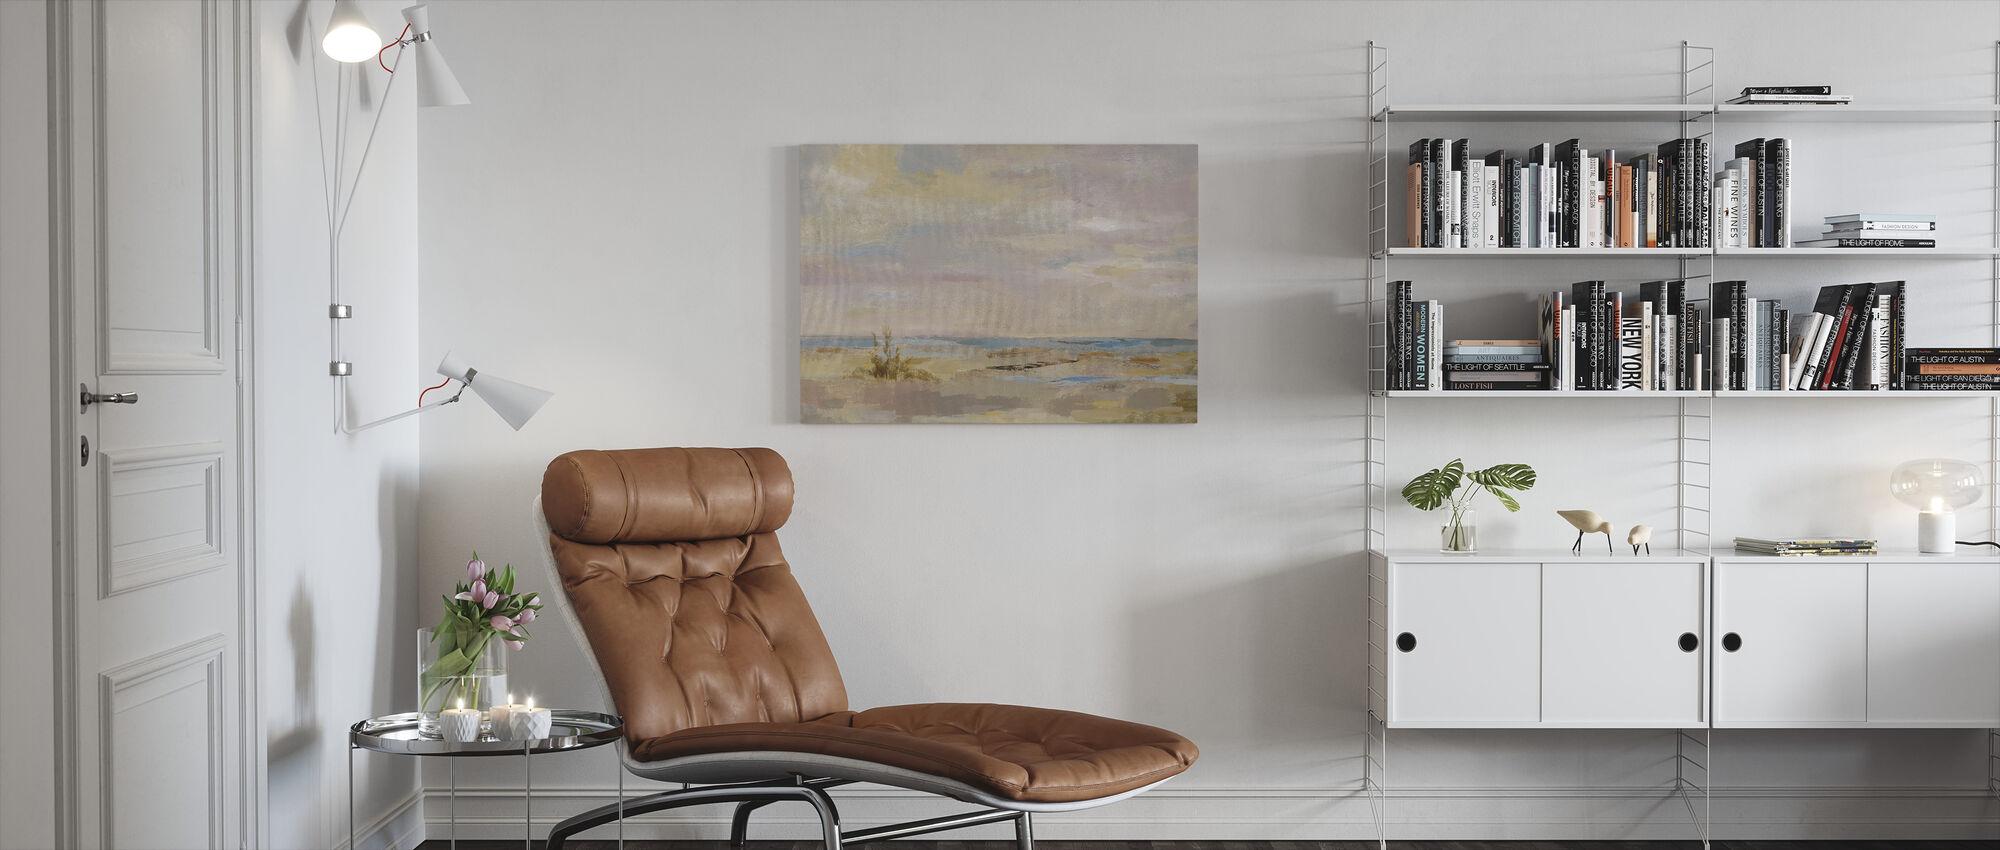 Dreamy Beach - Canvas print - Living Room